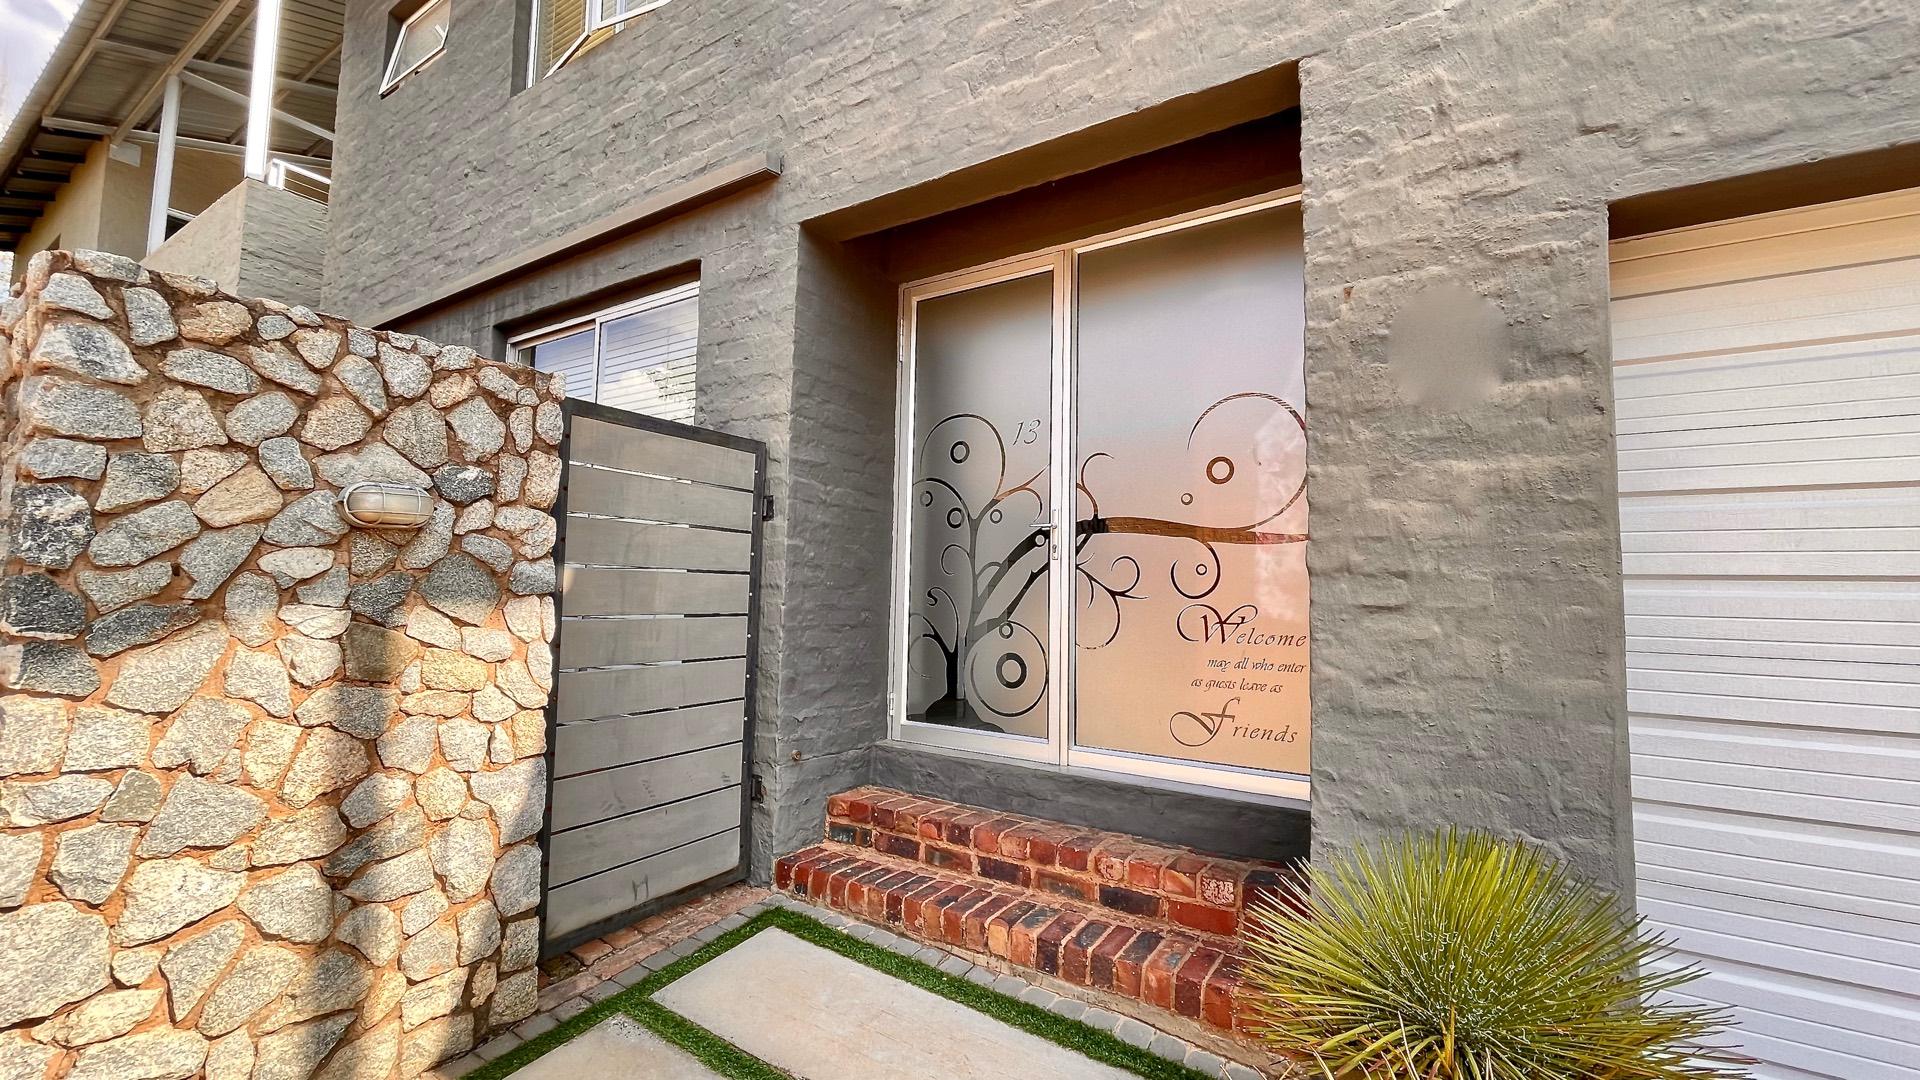 2 Bedroom Townhouse For Sale in Olympus AH